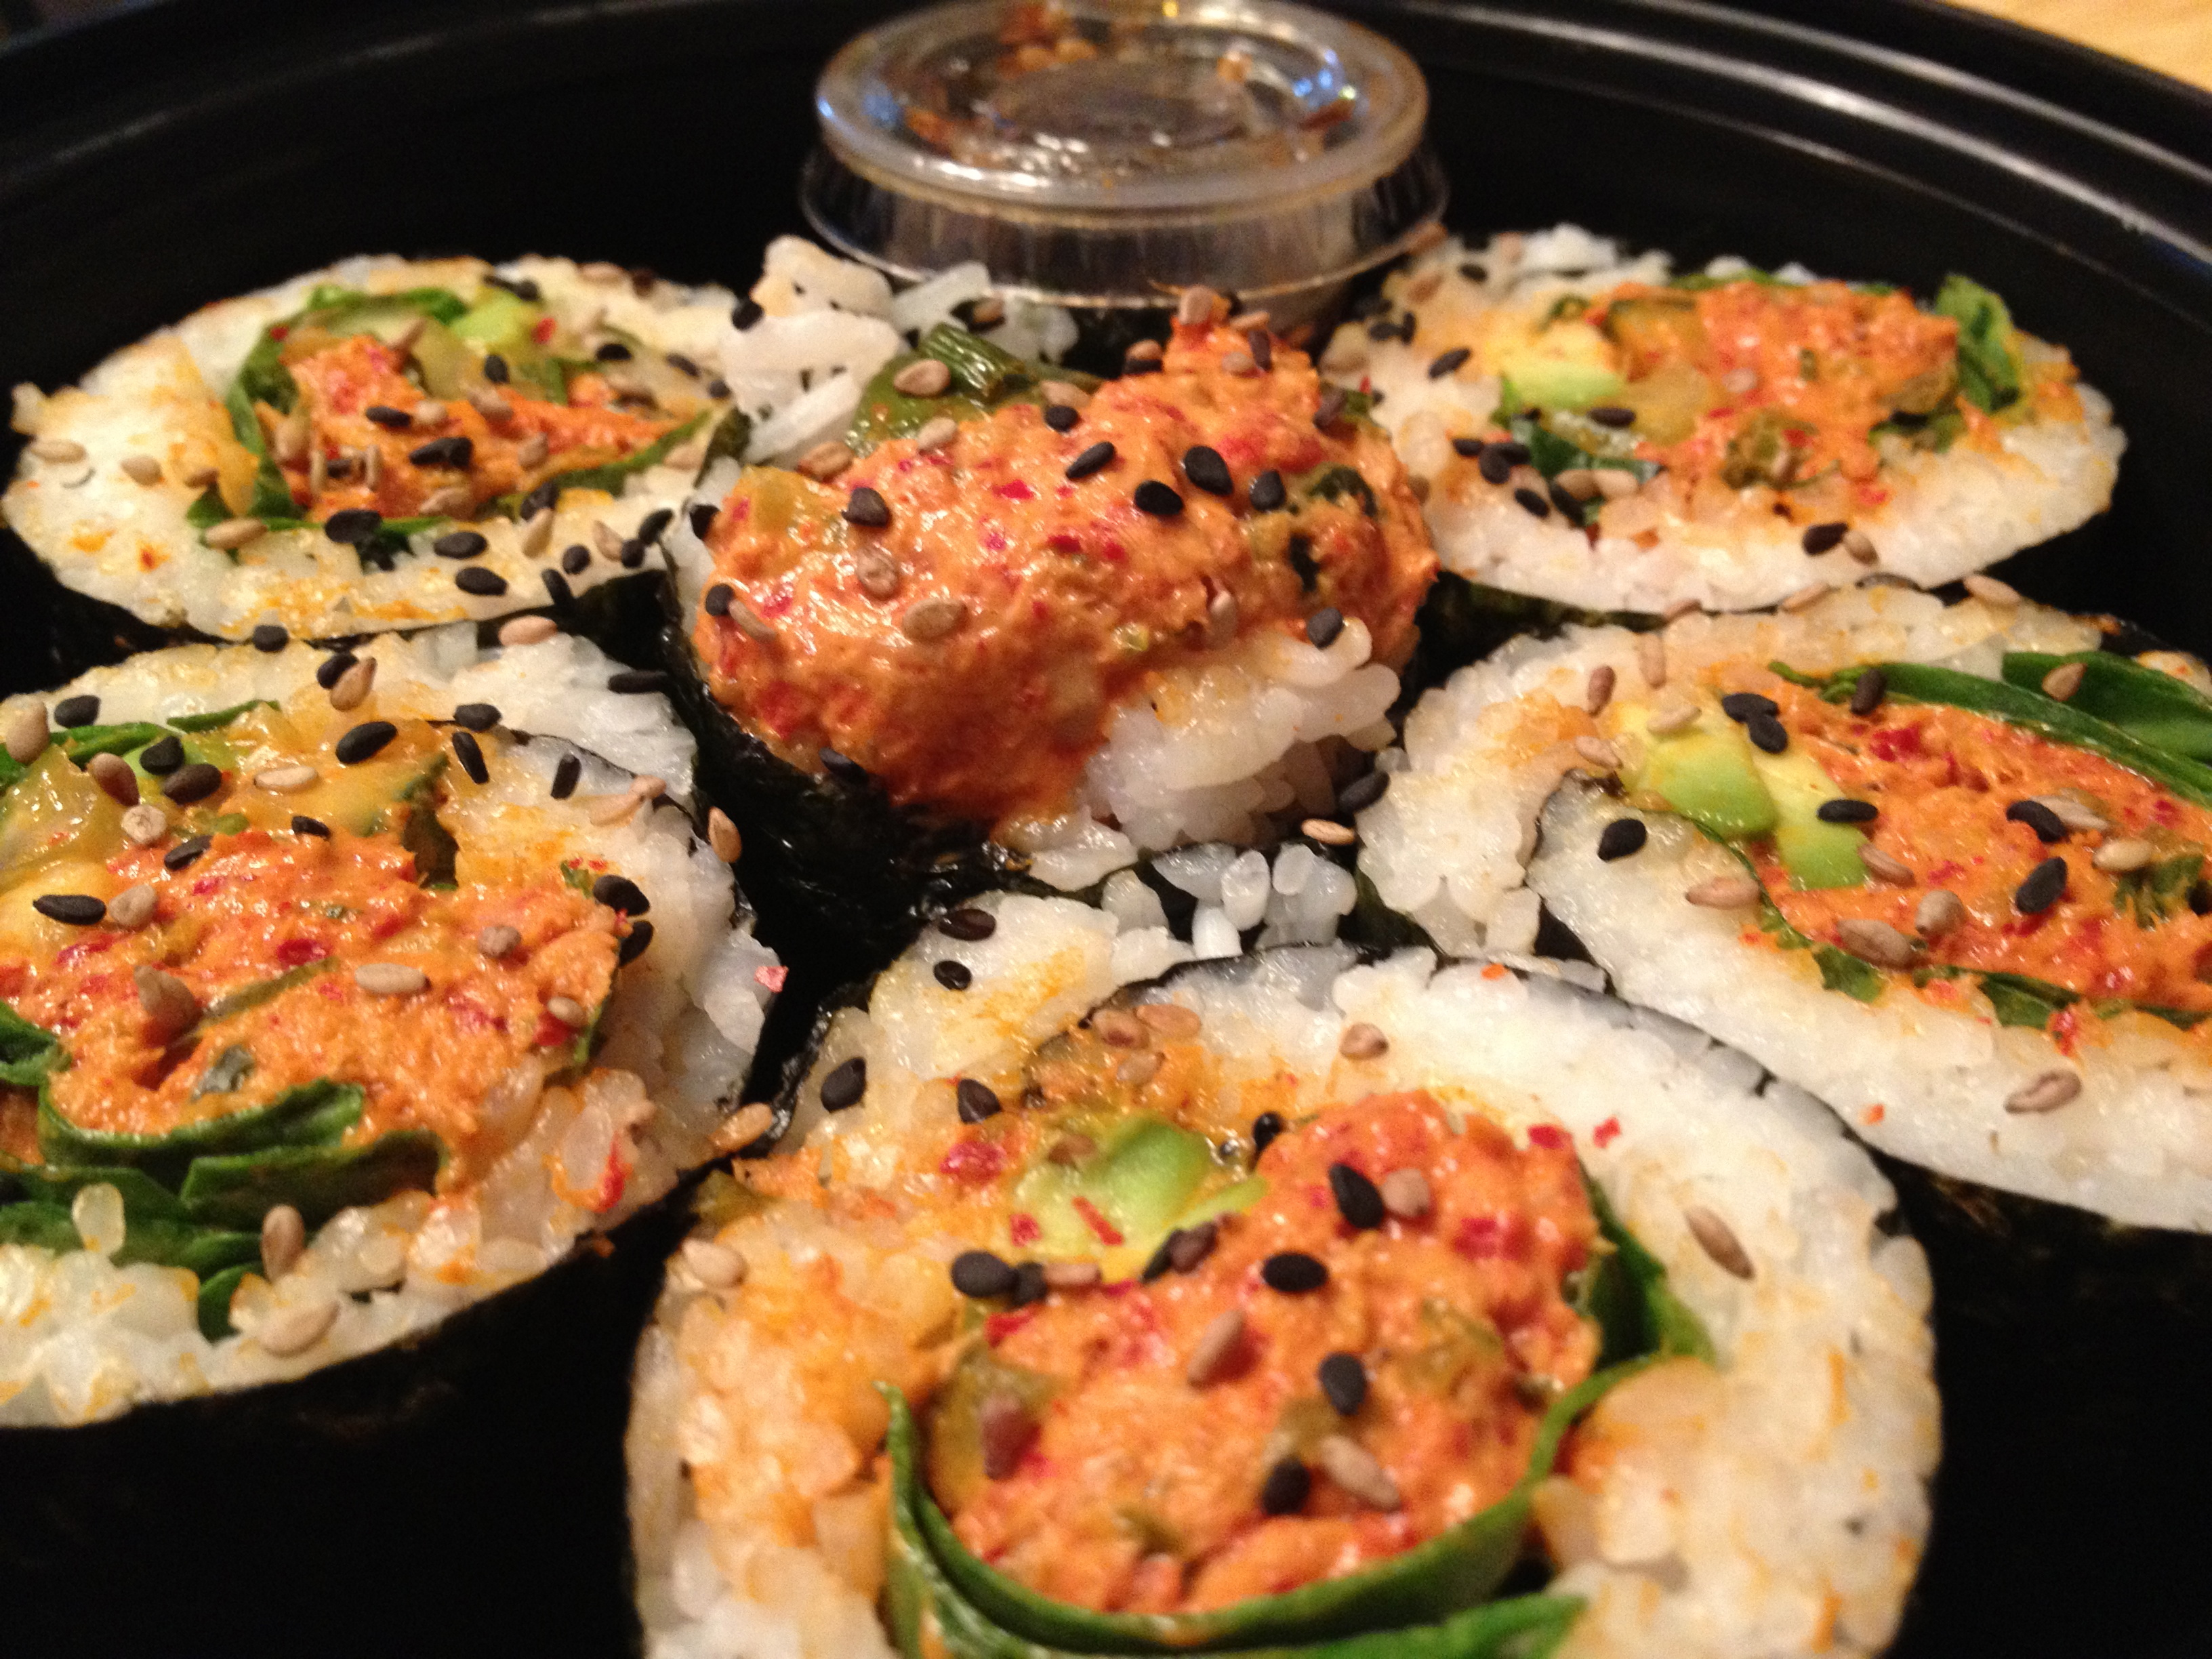 Spicy Tuna Maki  also super Seoul Food in Wheaton   Good Eatin  In Wheaton. Seoul Food Wheaton Md Menu. Home Design Ideas